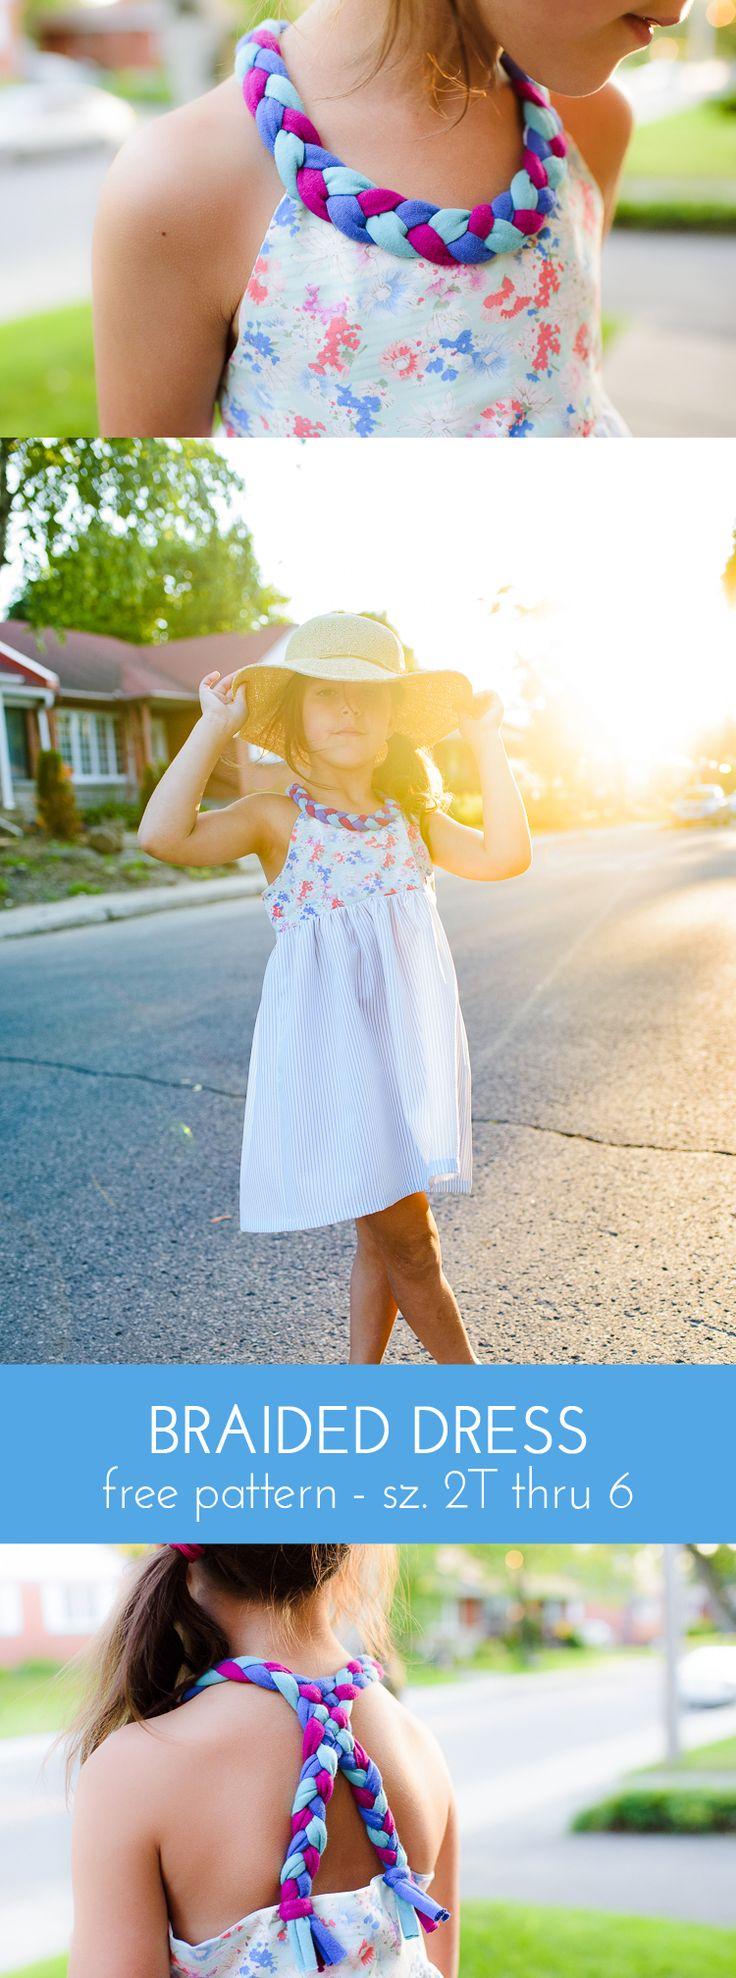 Braided Dress - free girls dress pattern, size 2T thru 6T